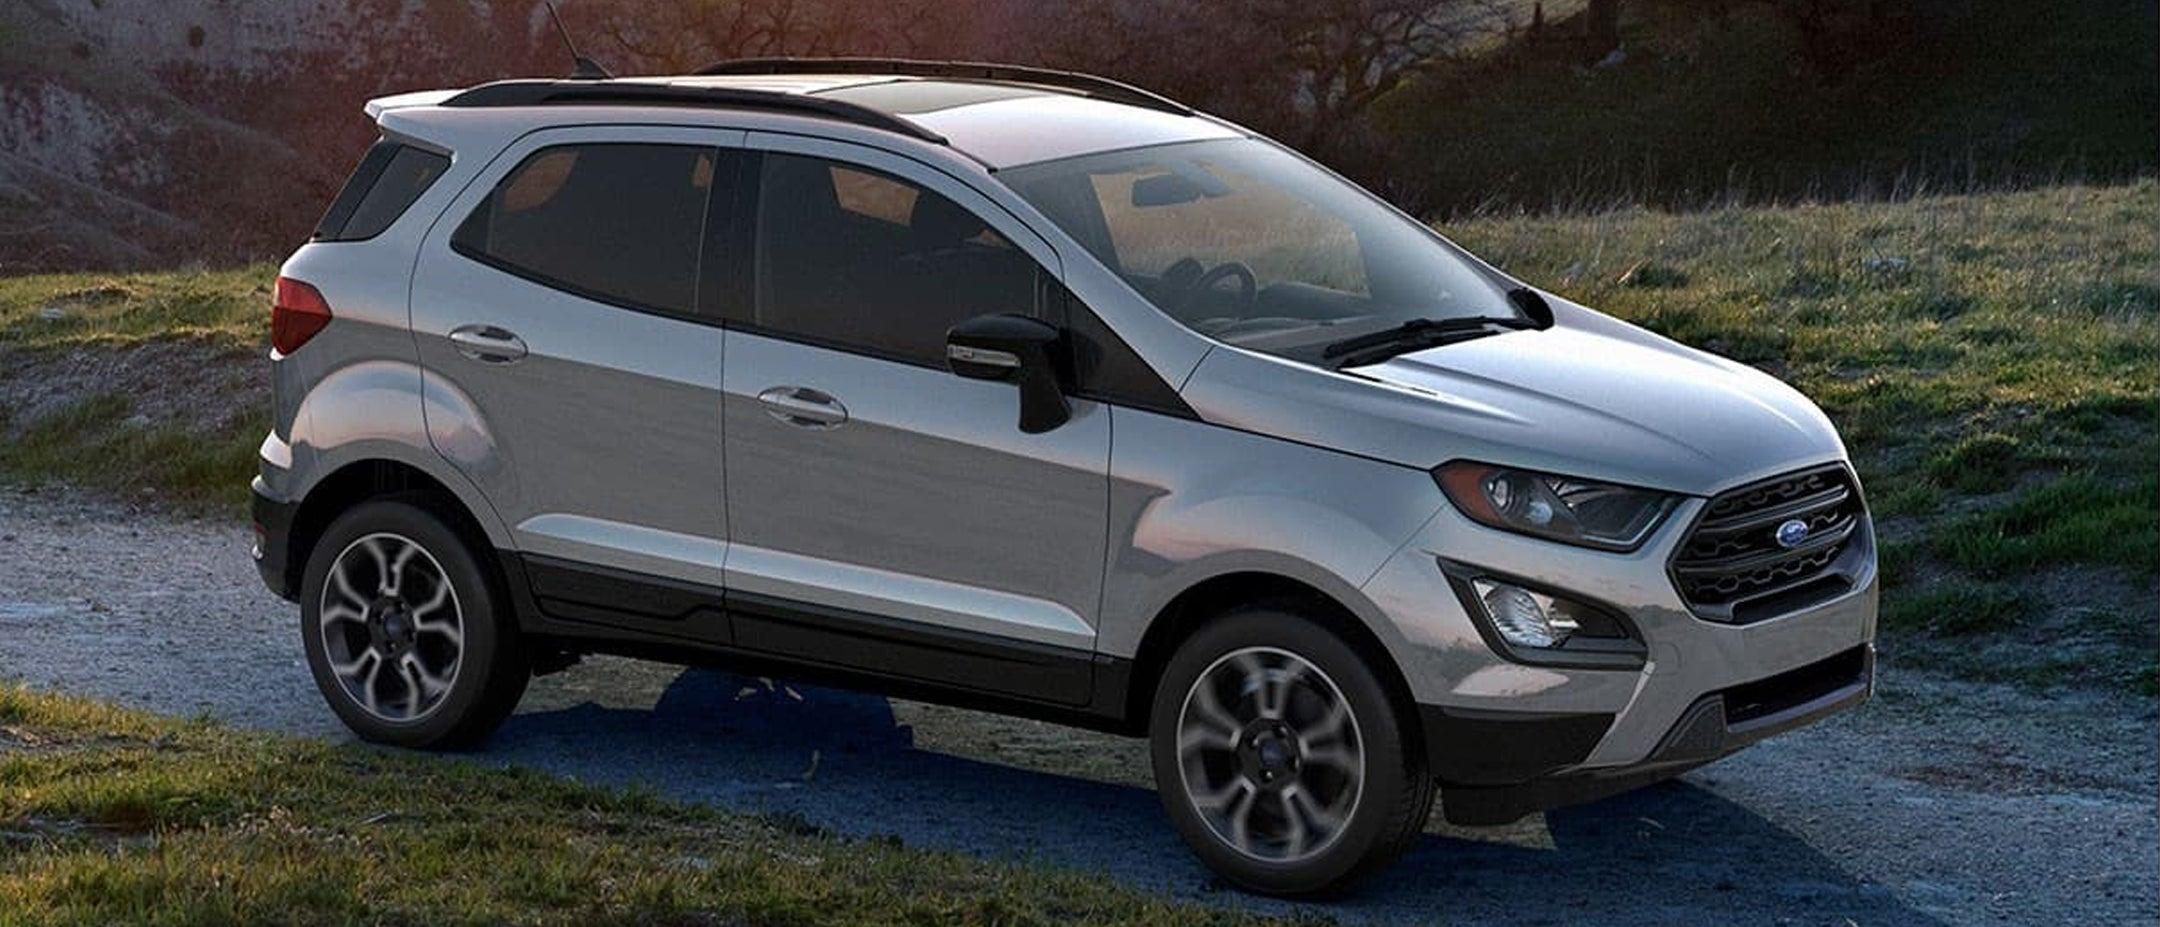 2020-Ford-Ecosport